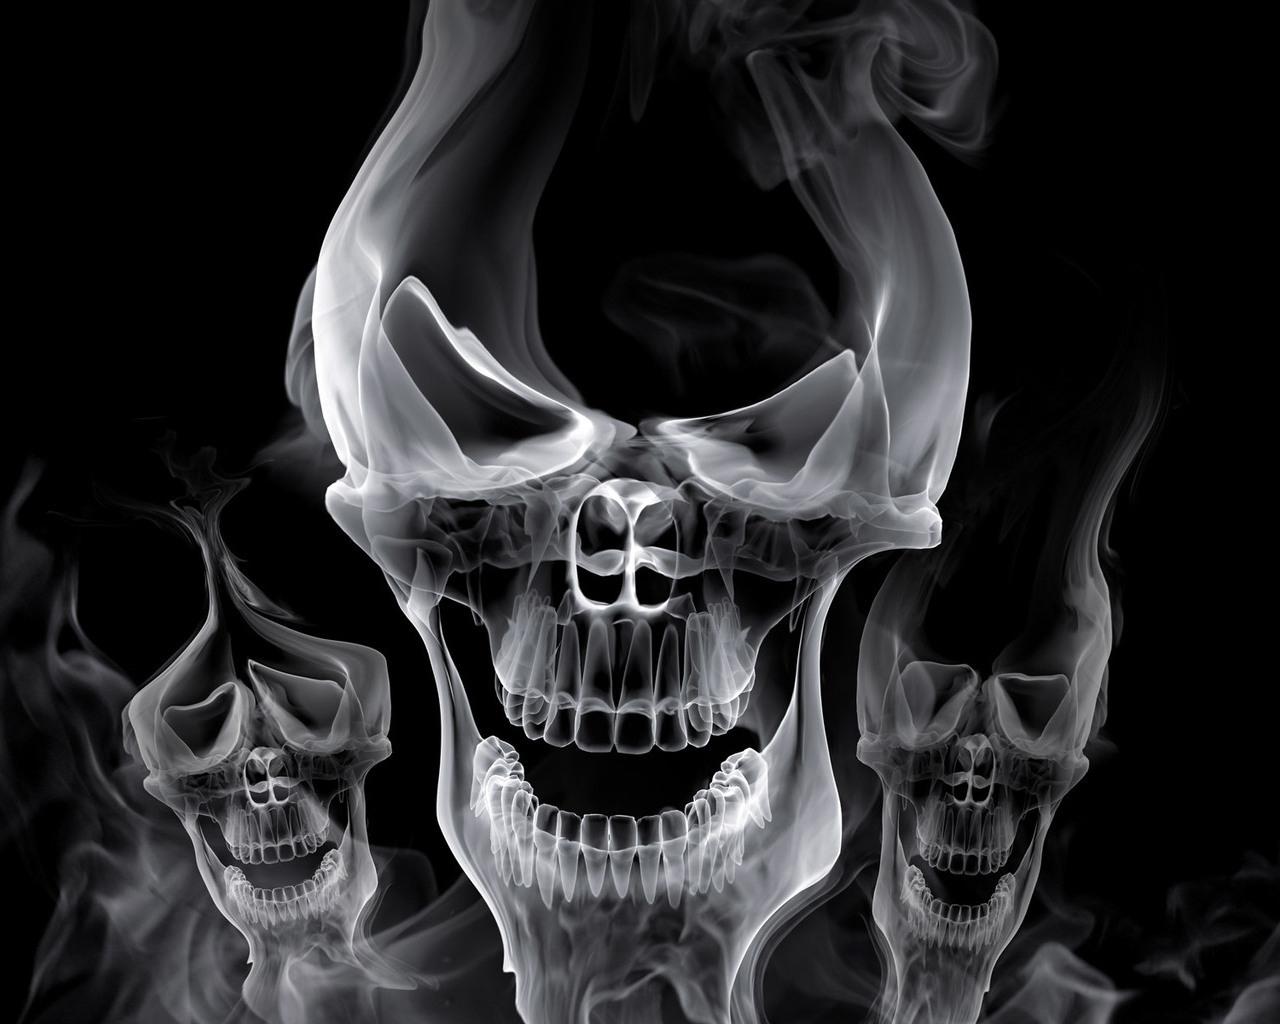 Skulls Wallpapers Abhi Wallpapers